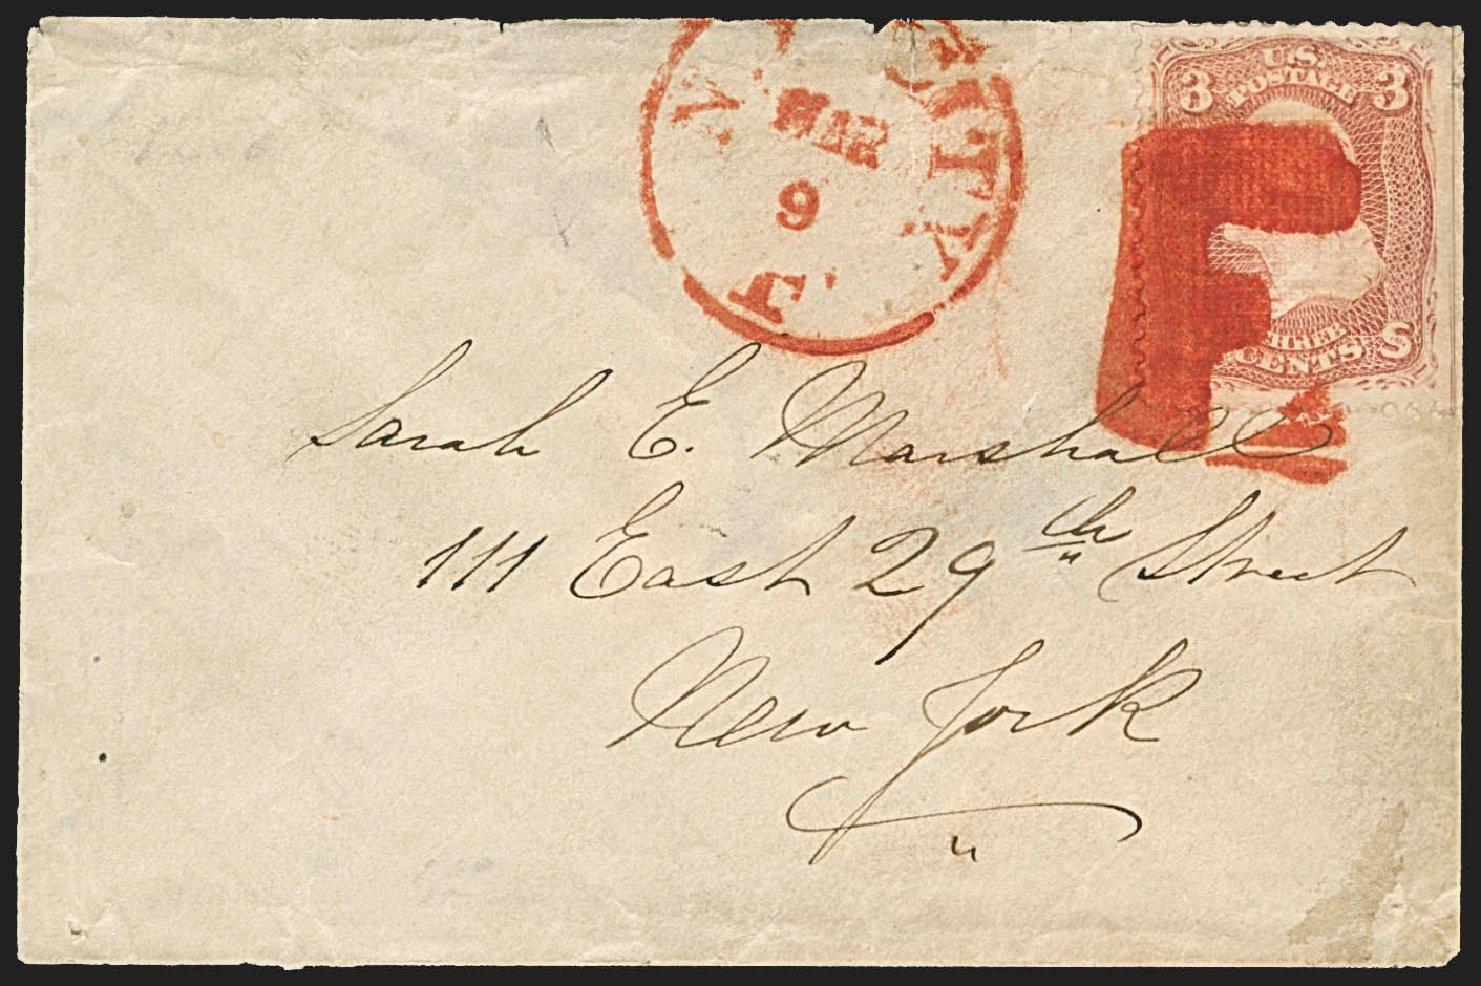 US Stamp Values Scott Catalogue # 88: 3c 1868 Washington Grill. Robert Siegel Auction Galleries, Jul 2015, Sale 1107, Lot 167